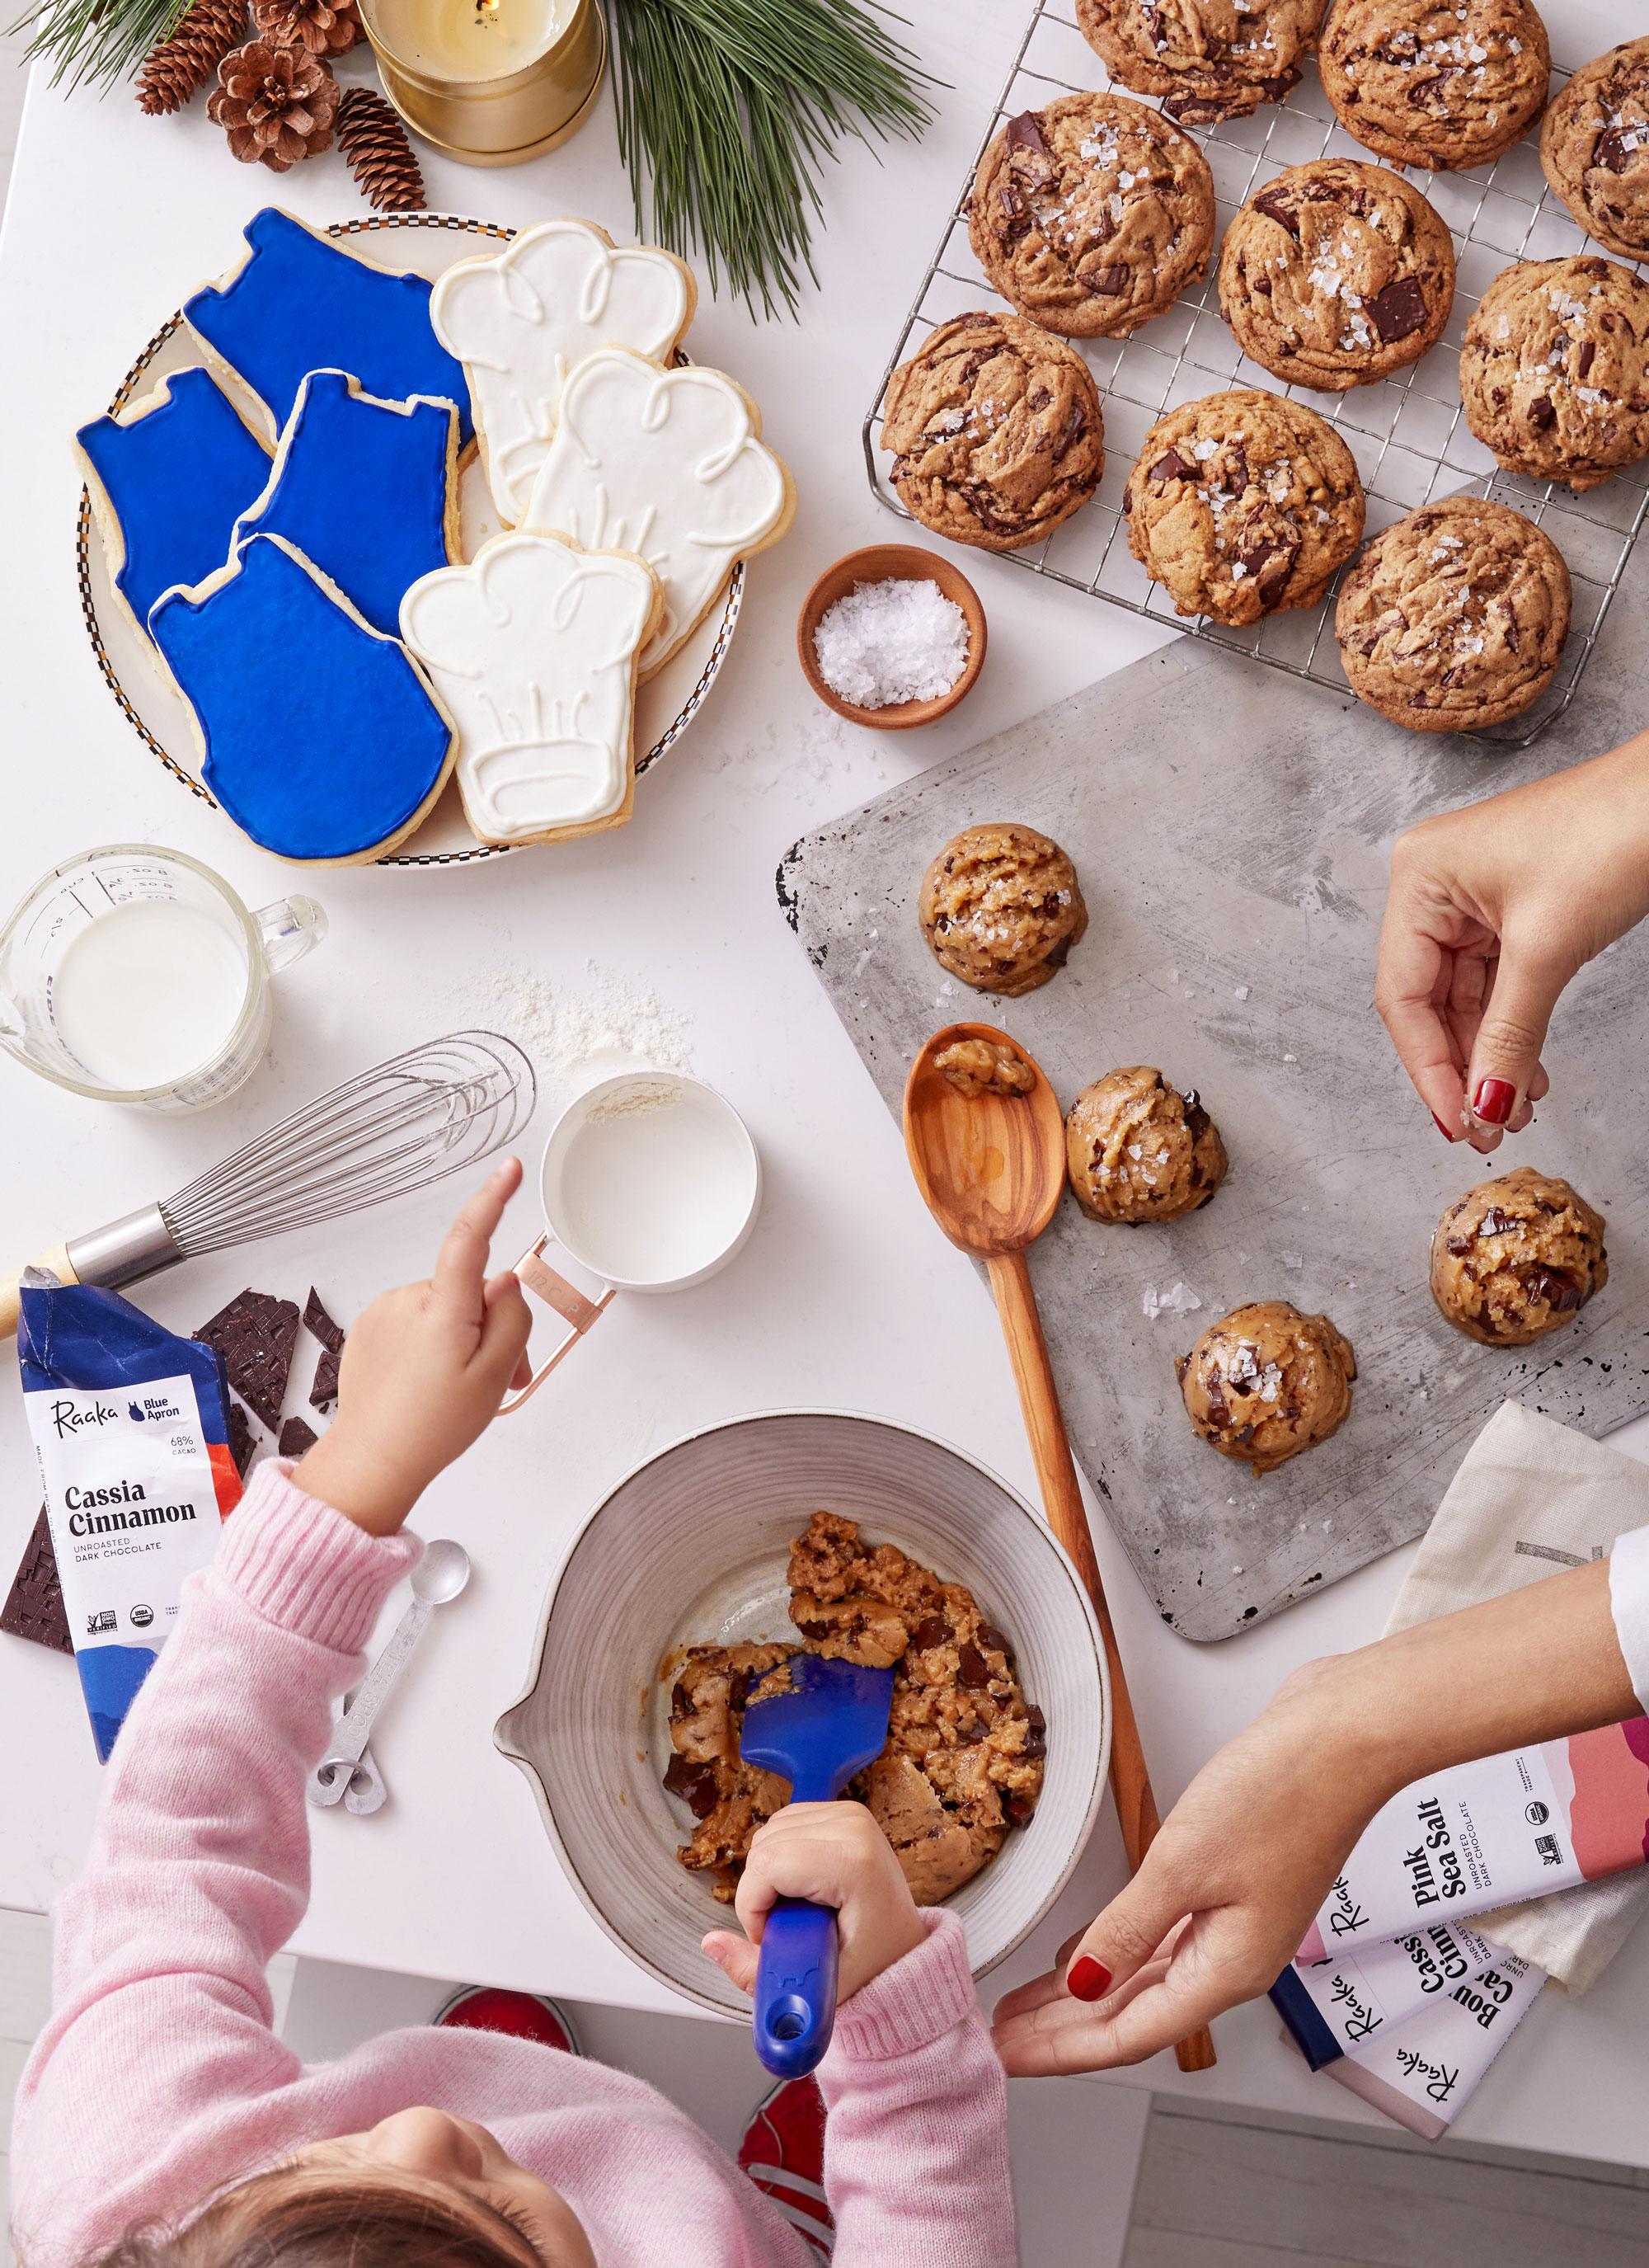 Baking-Cookies_Holiday-Gift-Guide_10218_976_RGB_crop.jpg